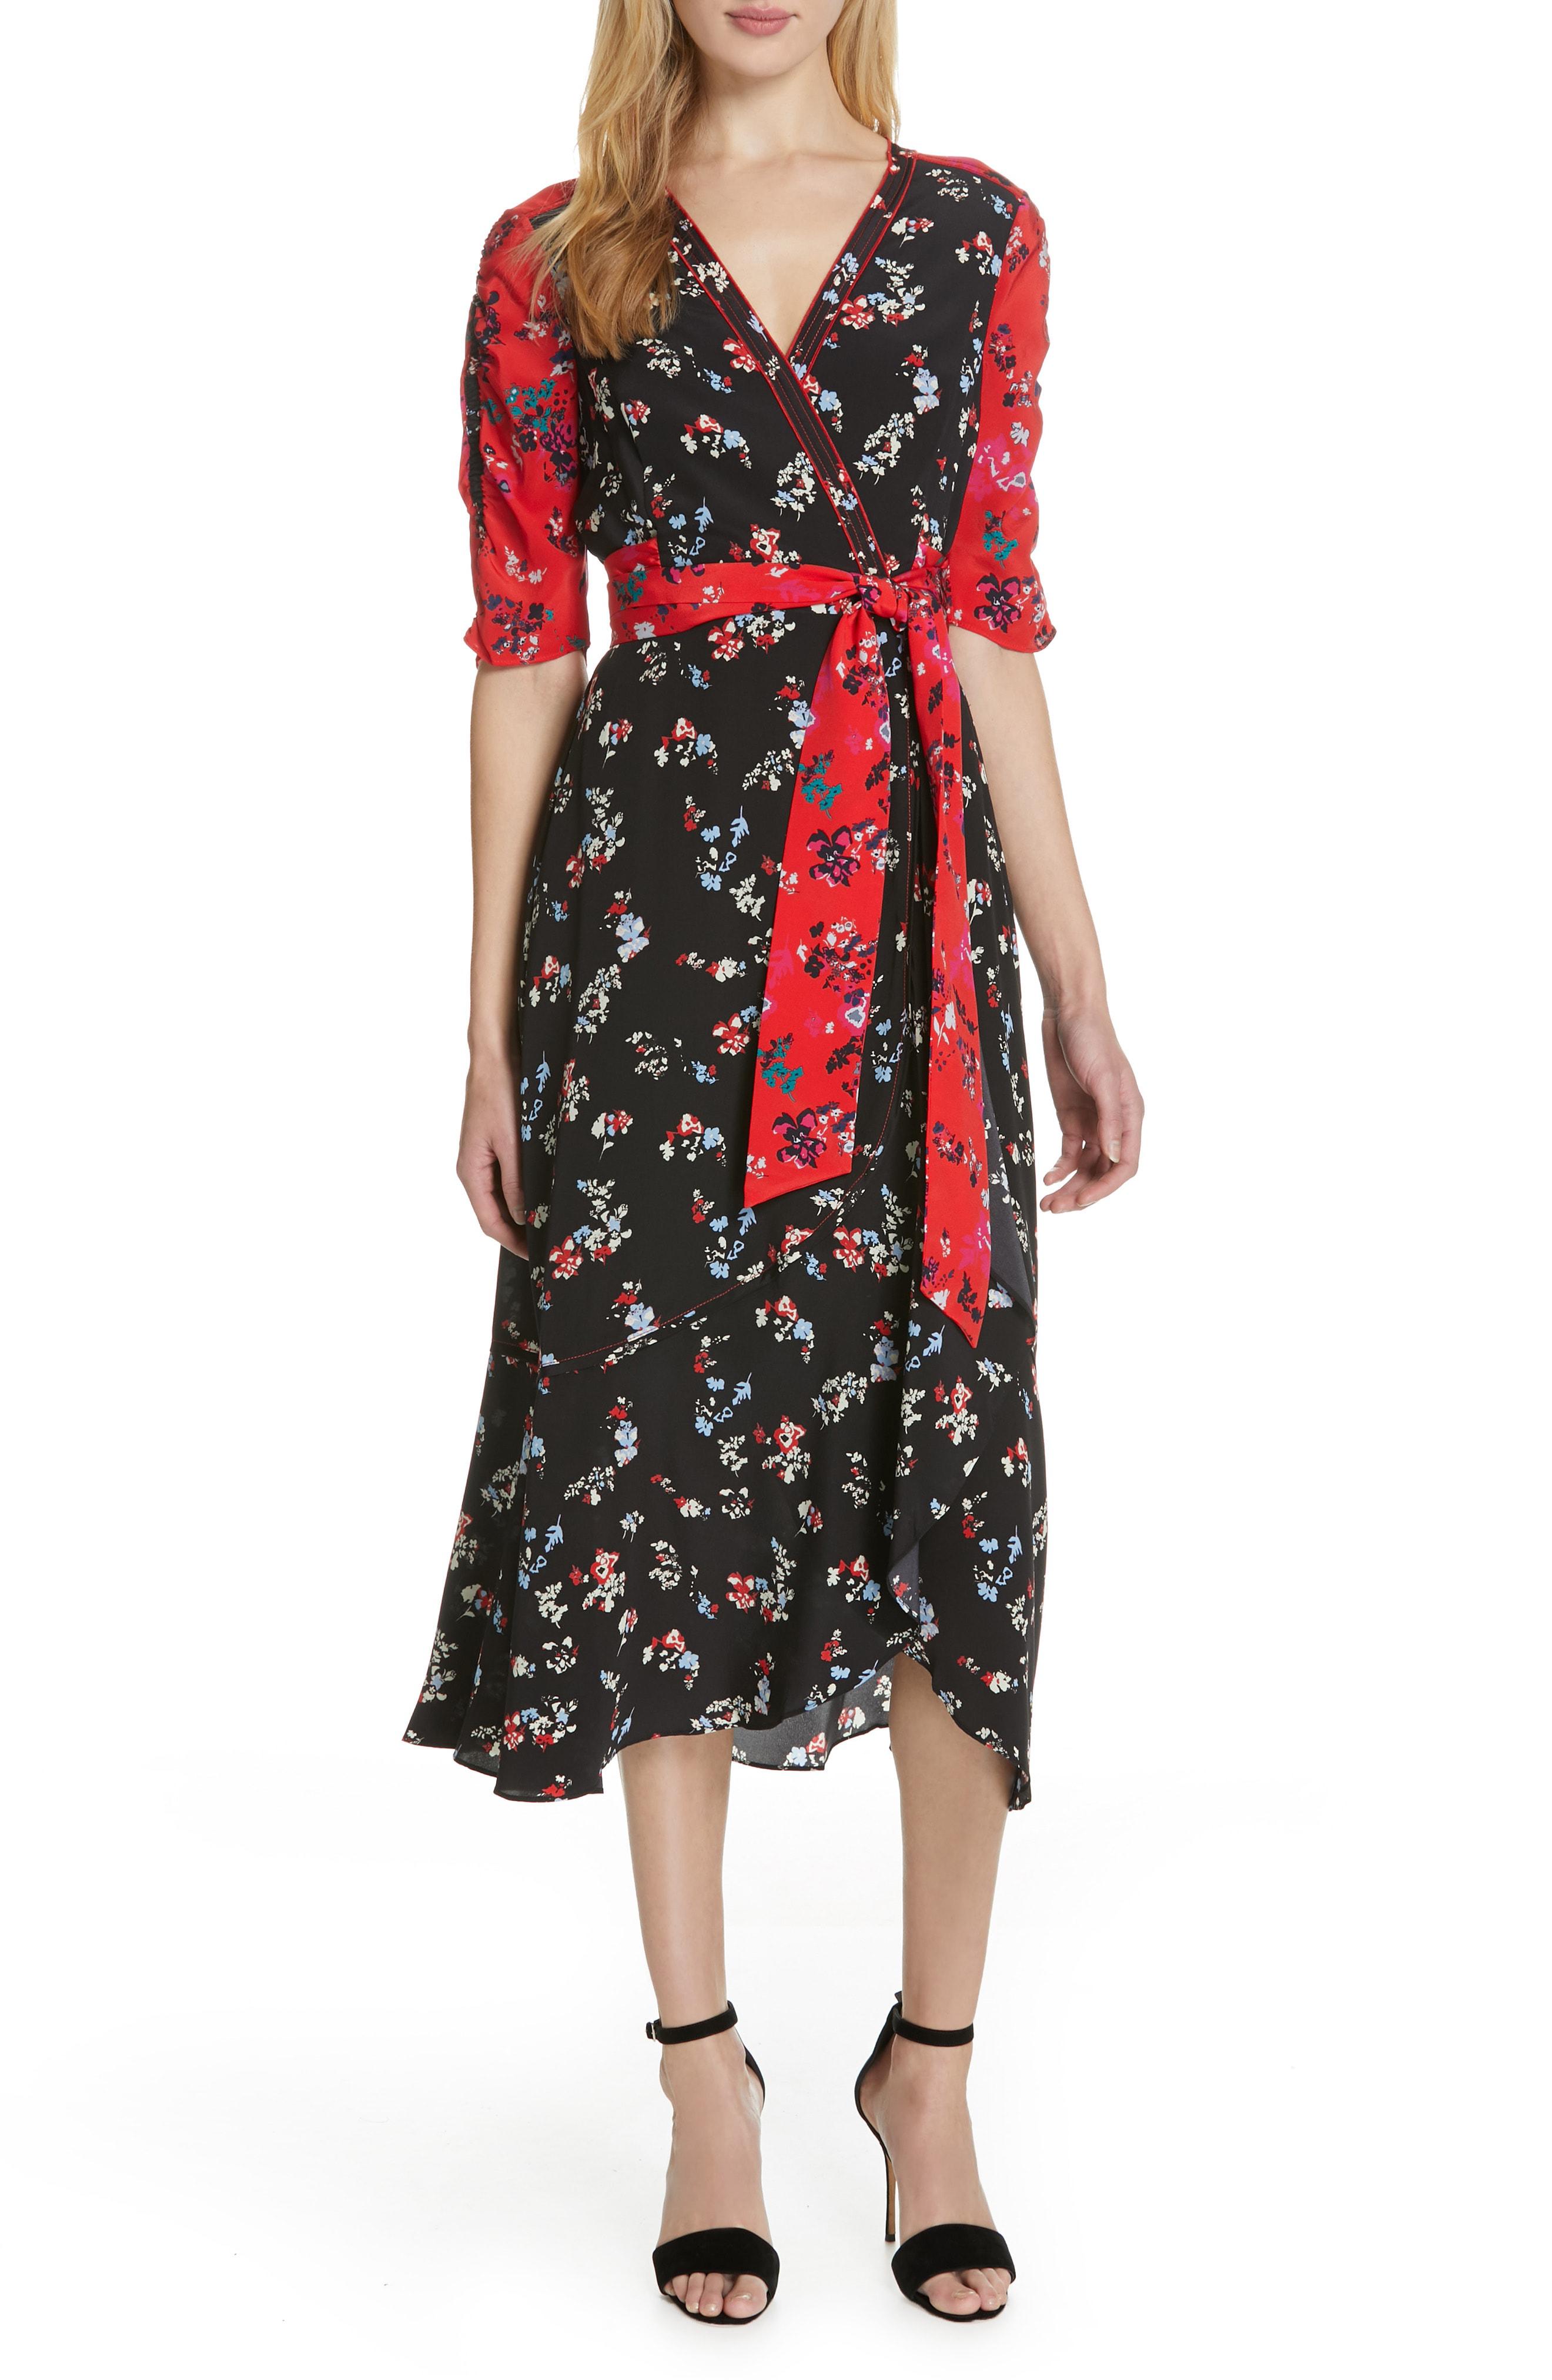 2b7c777379b2 Tanya Taylor Blaire Floral-Print Silk Short-Sleeve Wrap Dress